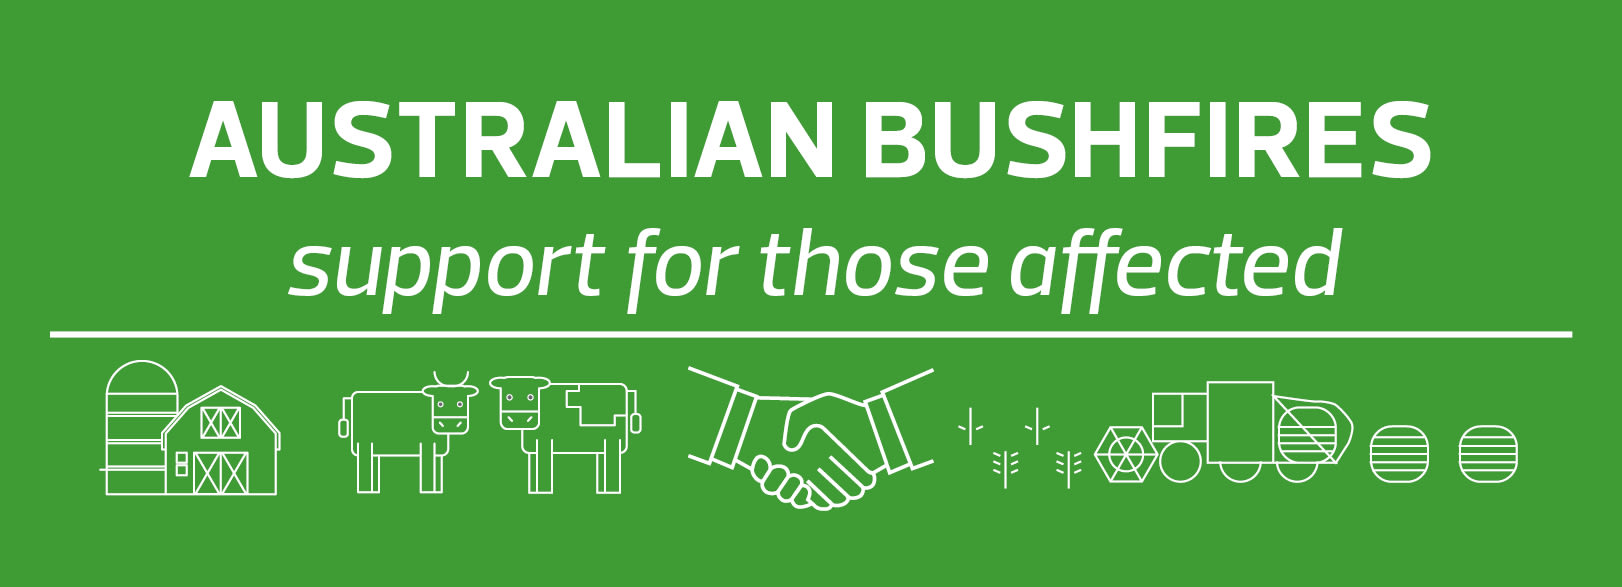 2019-20 Australia Bushfires | Support for those affected